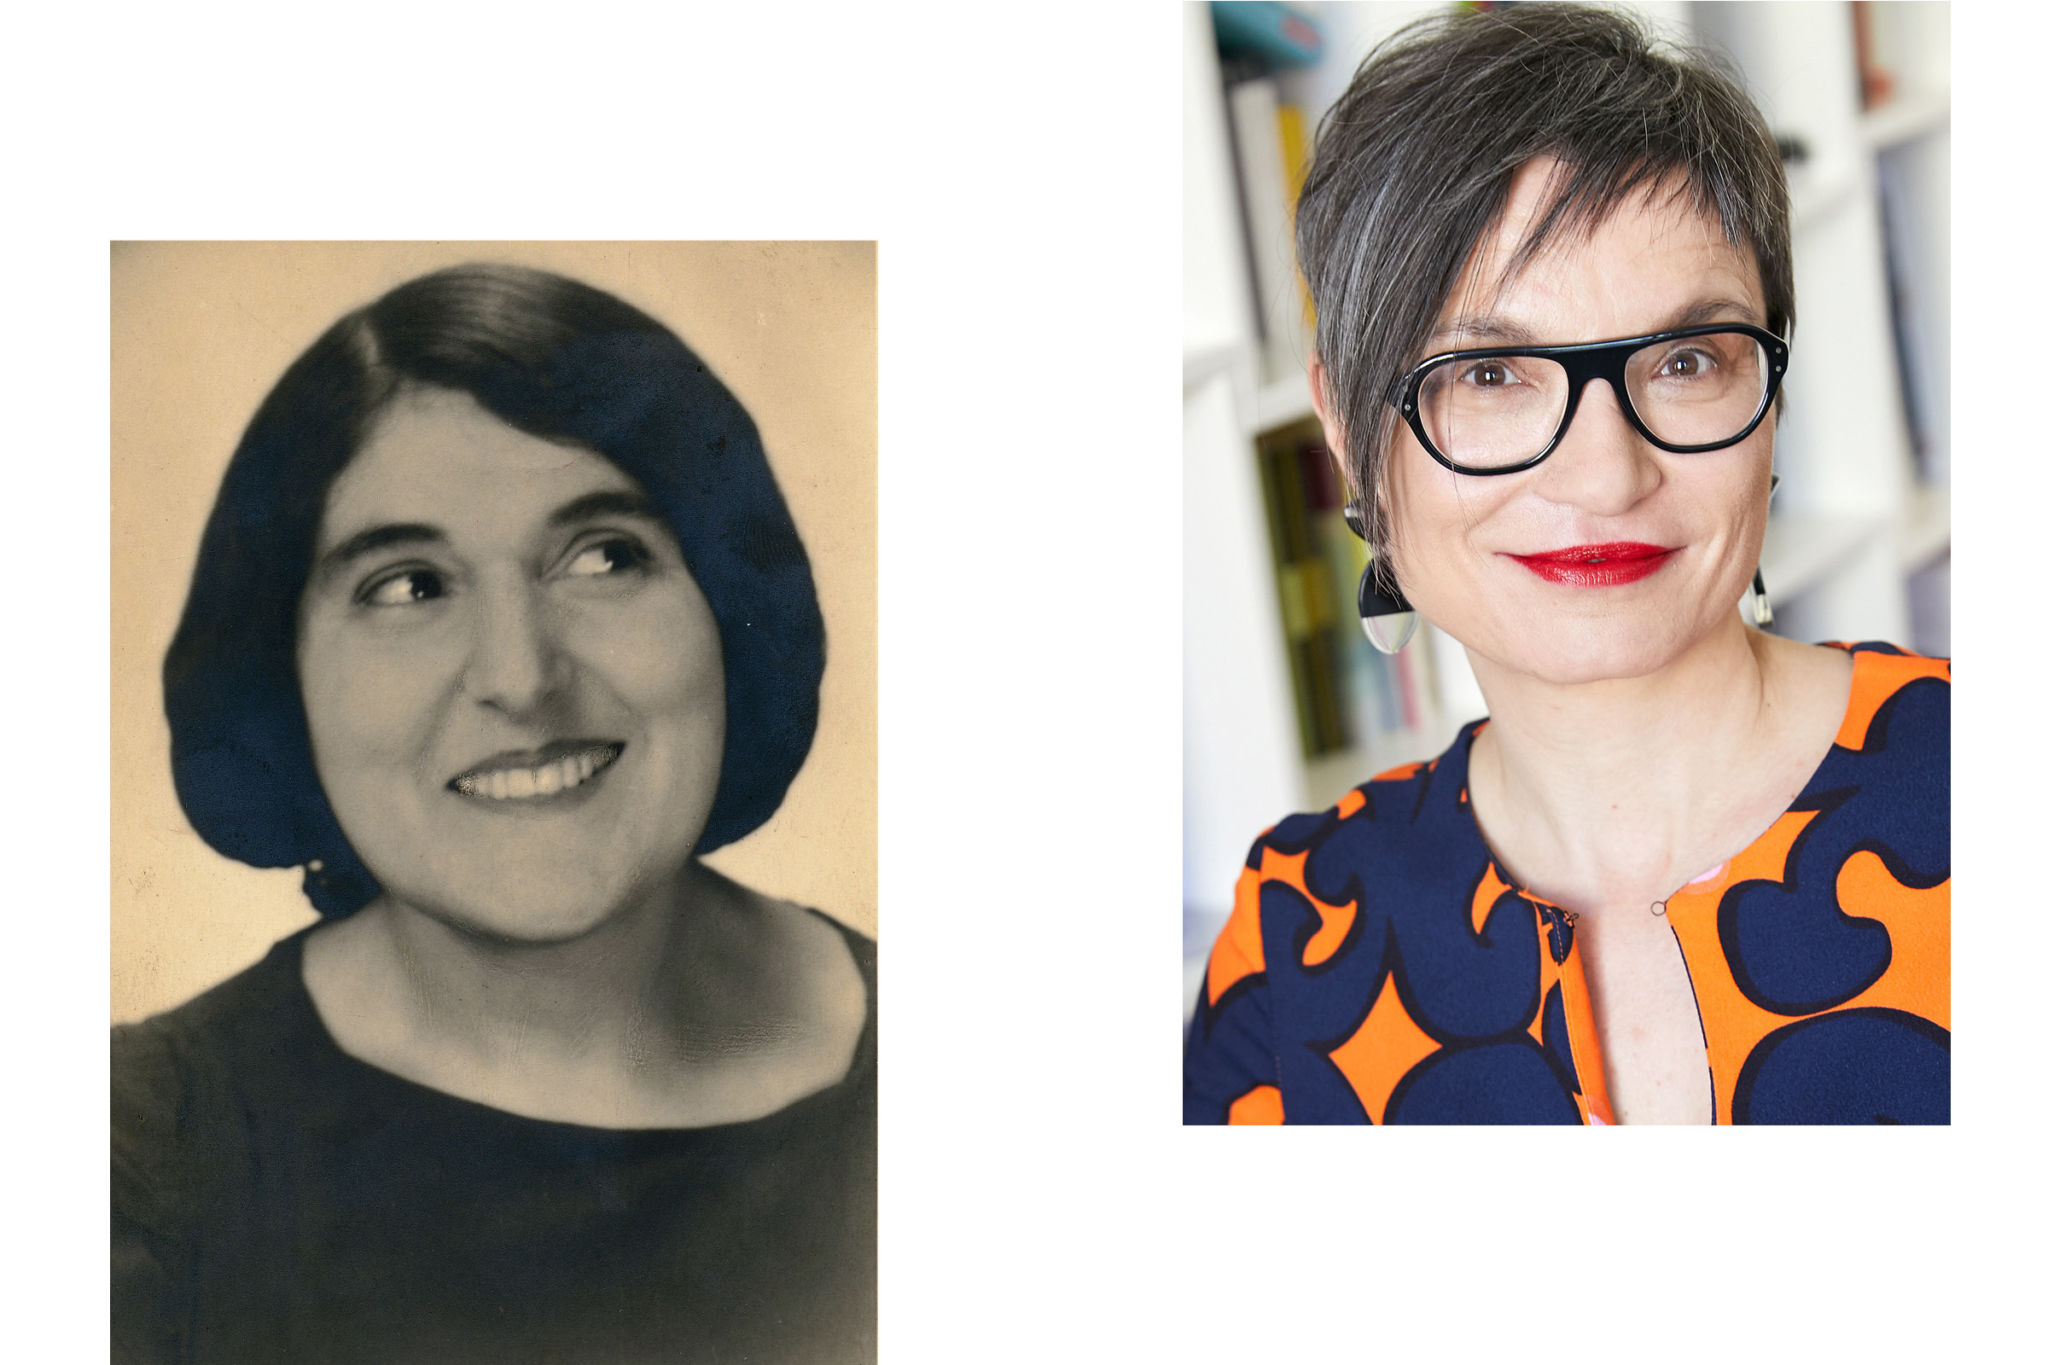 (c) Johanna Canetti & Lisa Rastl